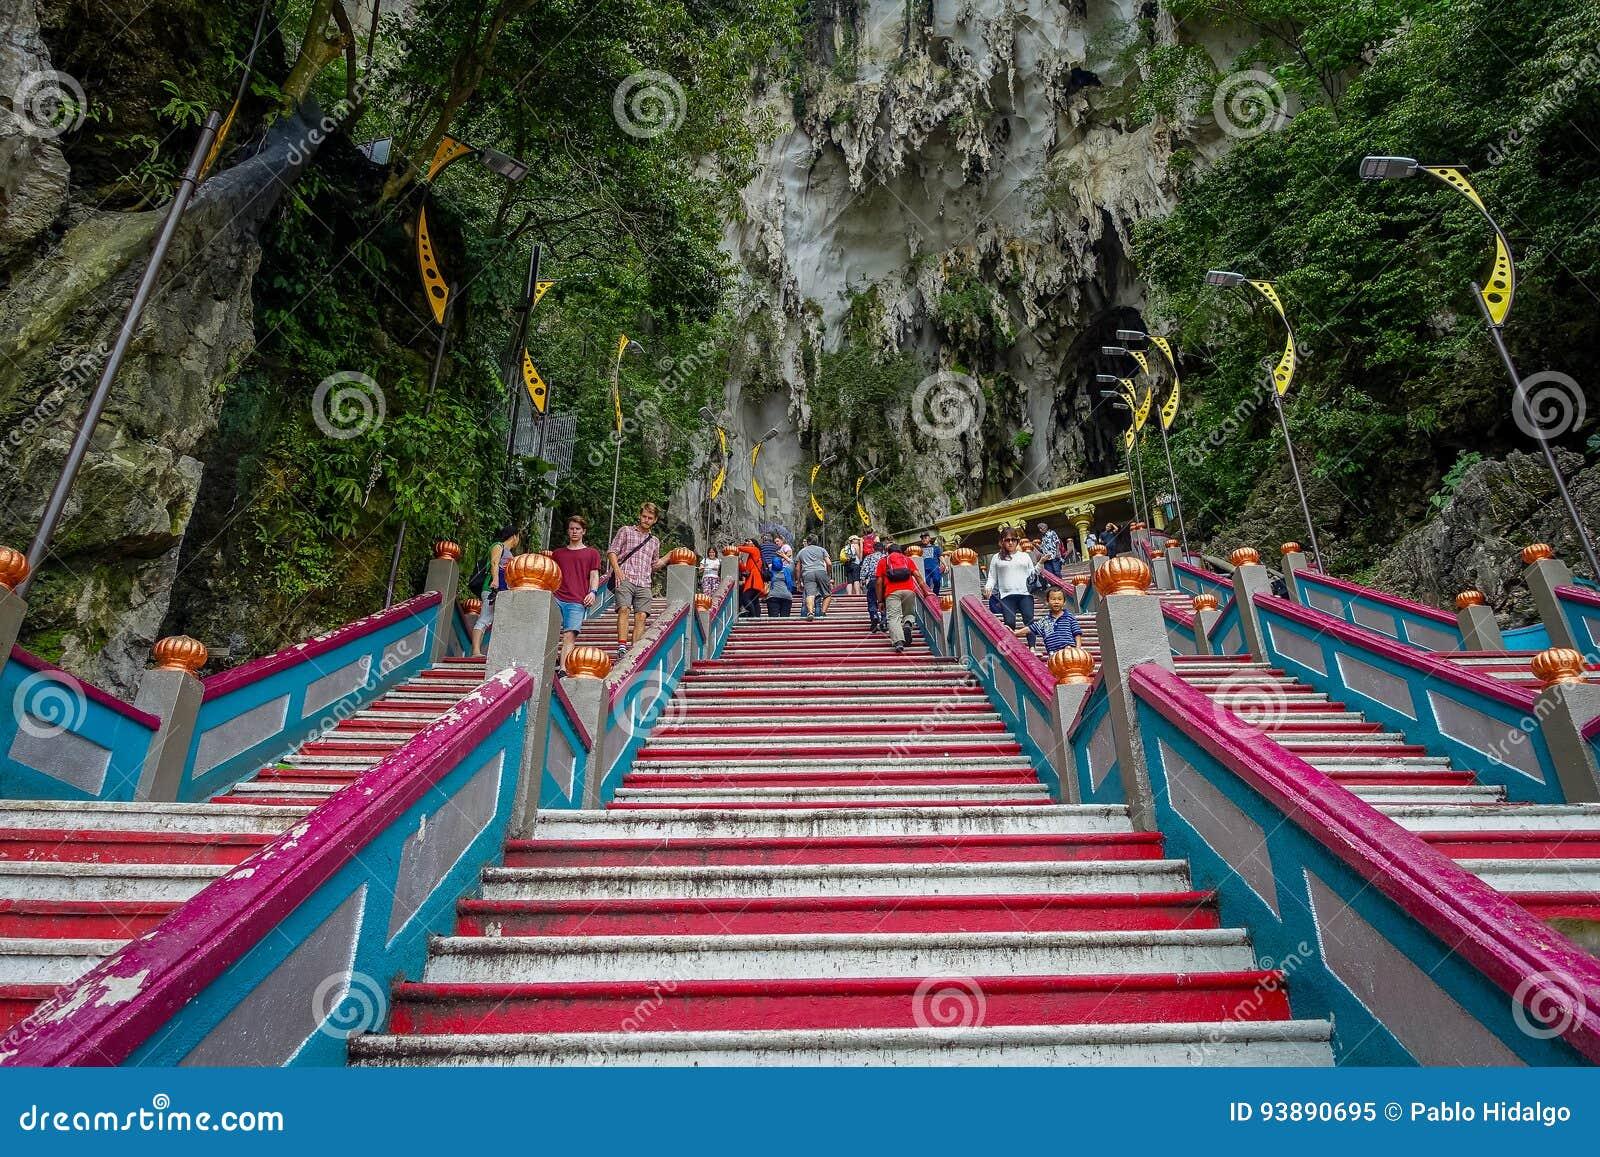 kuala lumpur, malaysia - march 9, 2017: stairs in batu caves, a